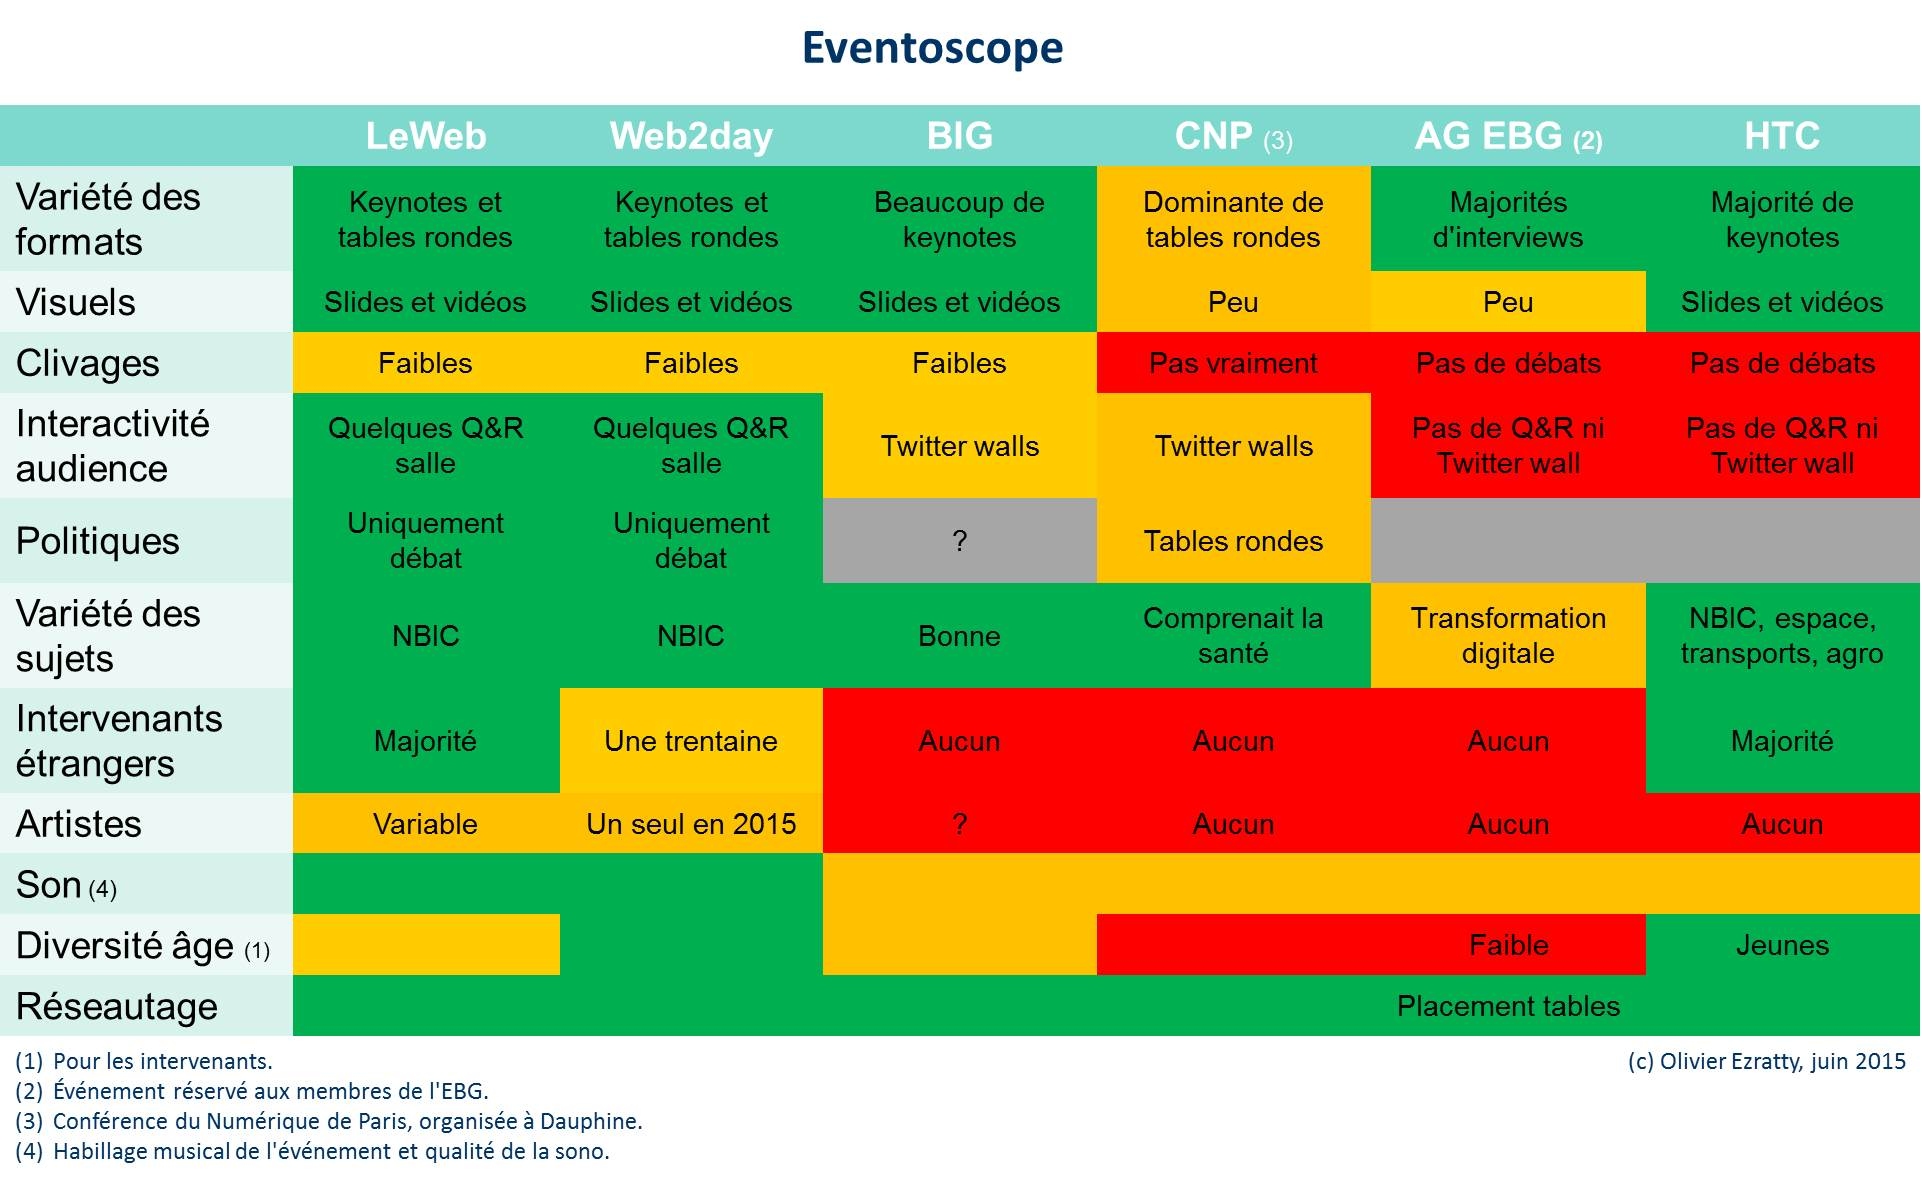 Eventoscope Olivier Ezratty